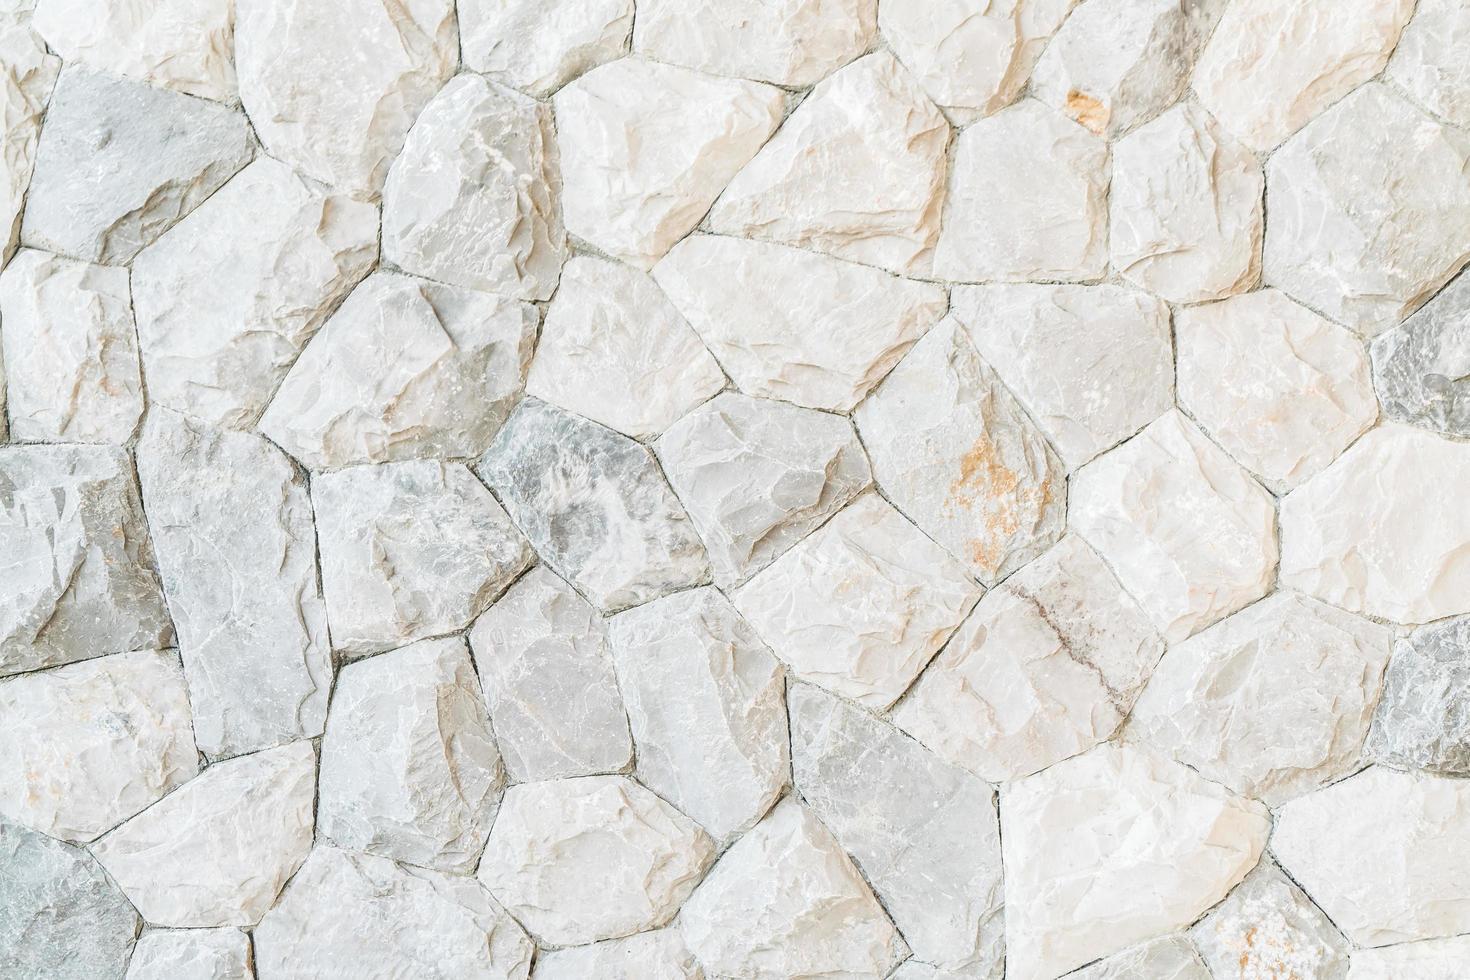 witte steenstructuren foto